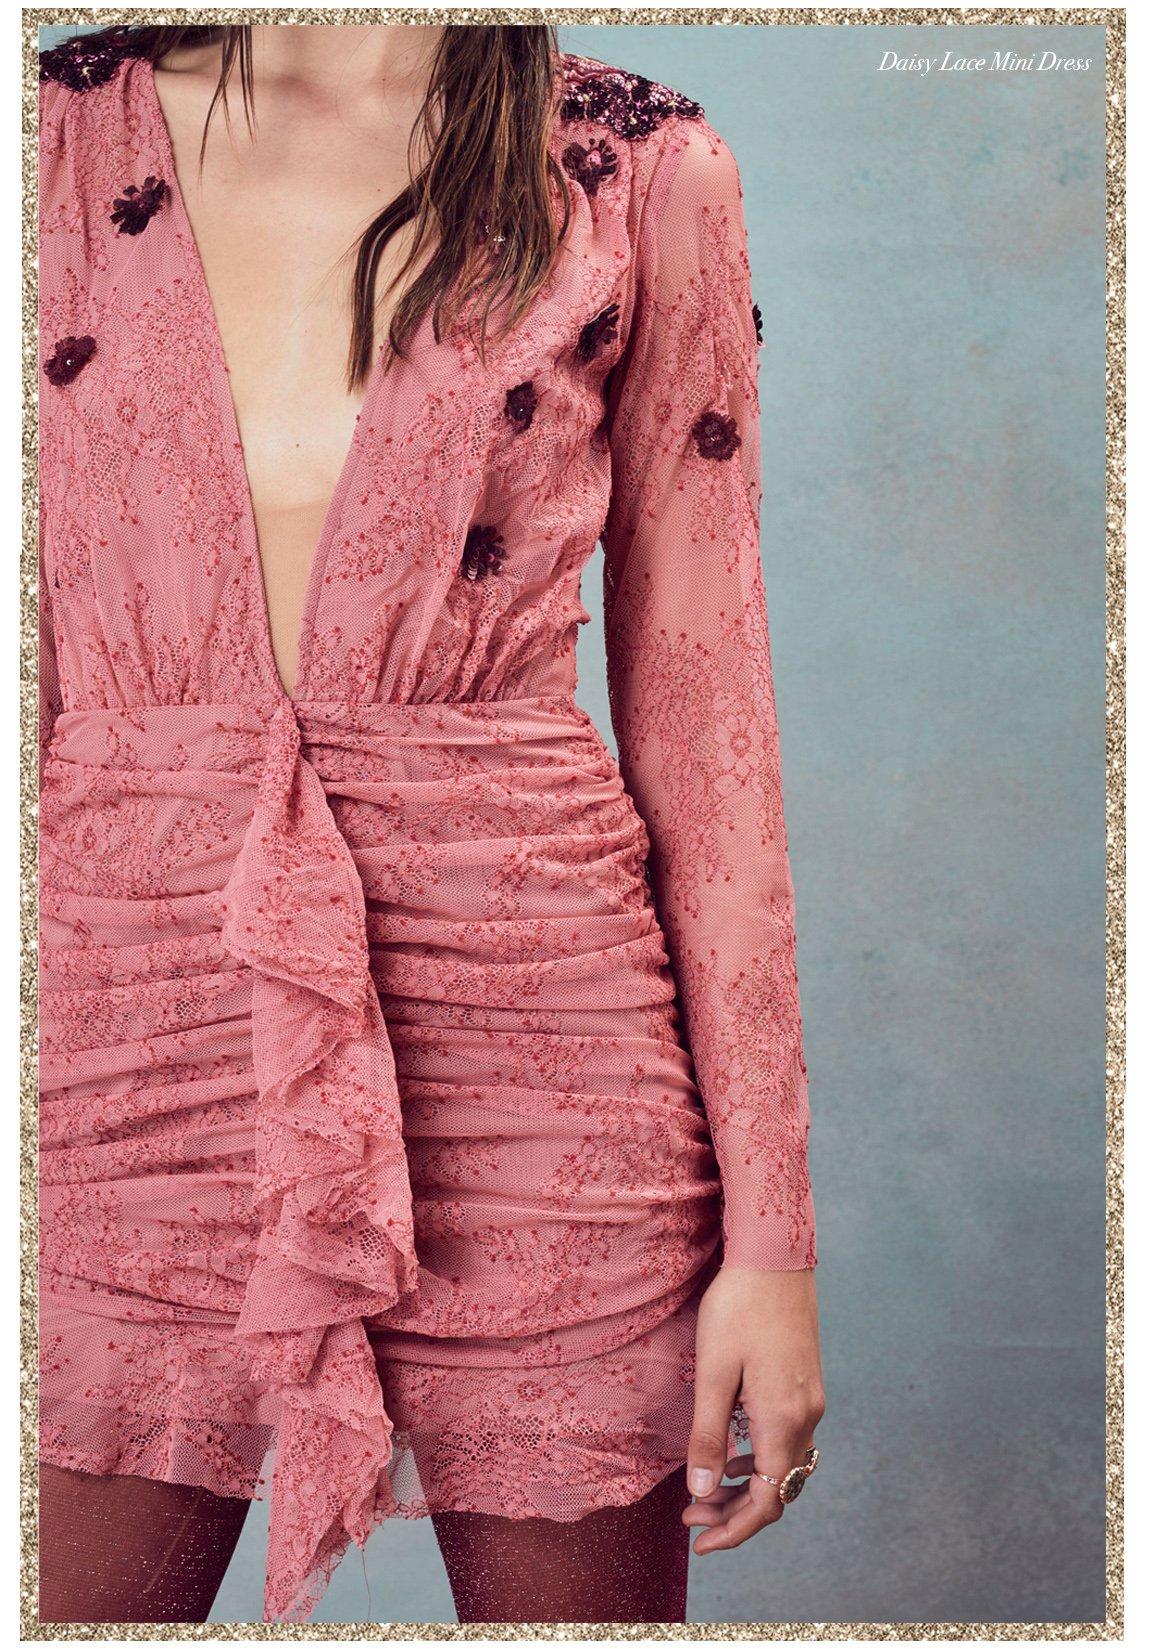 Daisy Lace Mini Dress